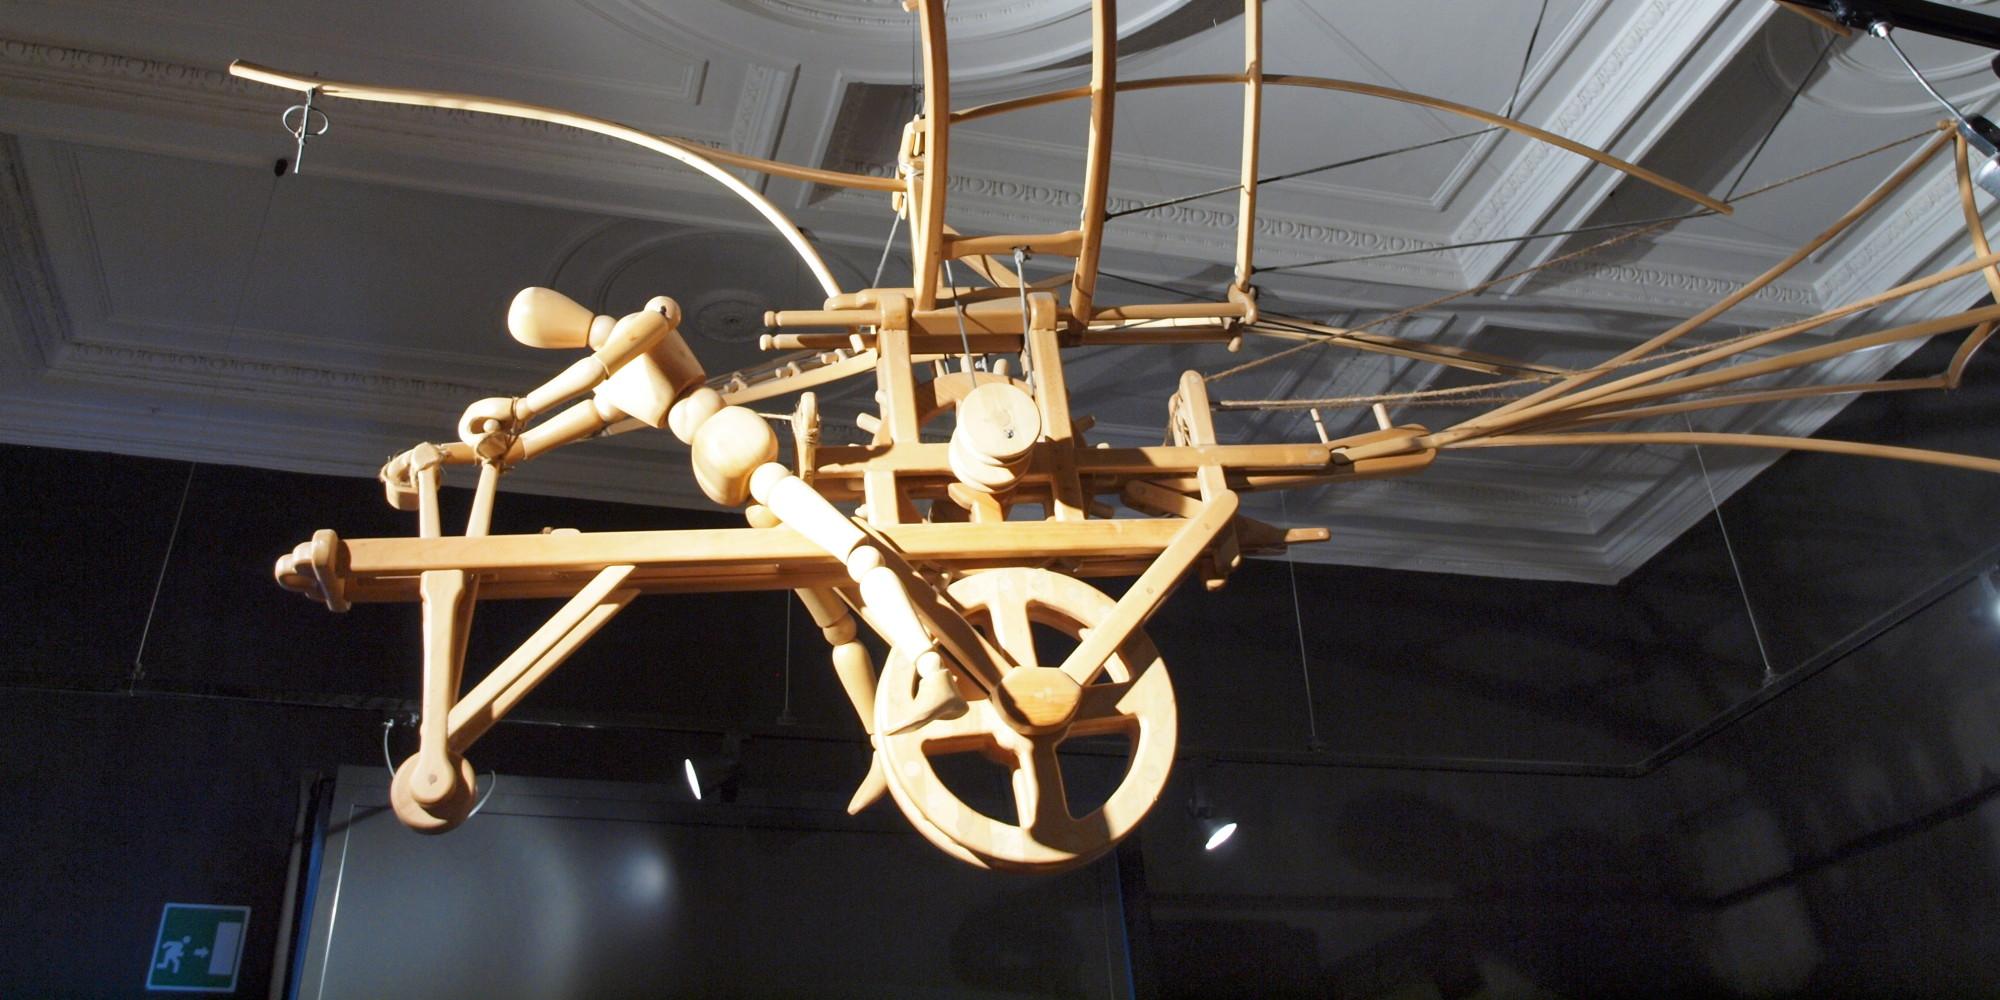 Fascinating Leonardo Da Vinci Exhibition Opens At Science